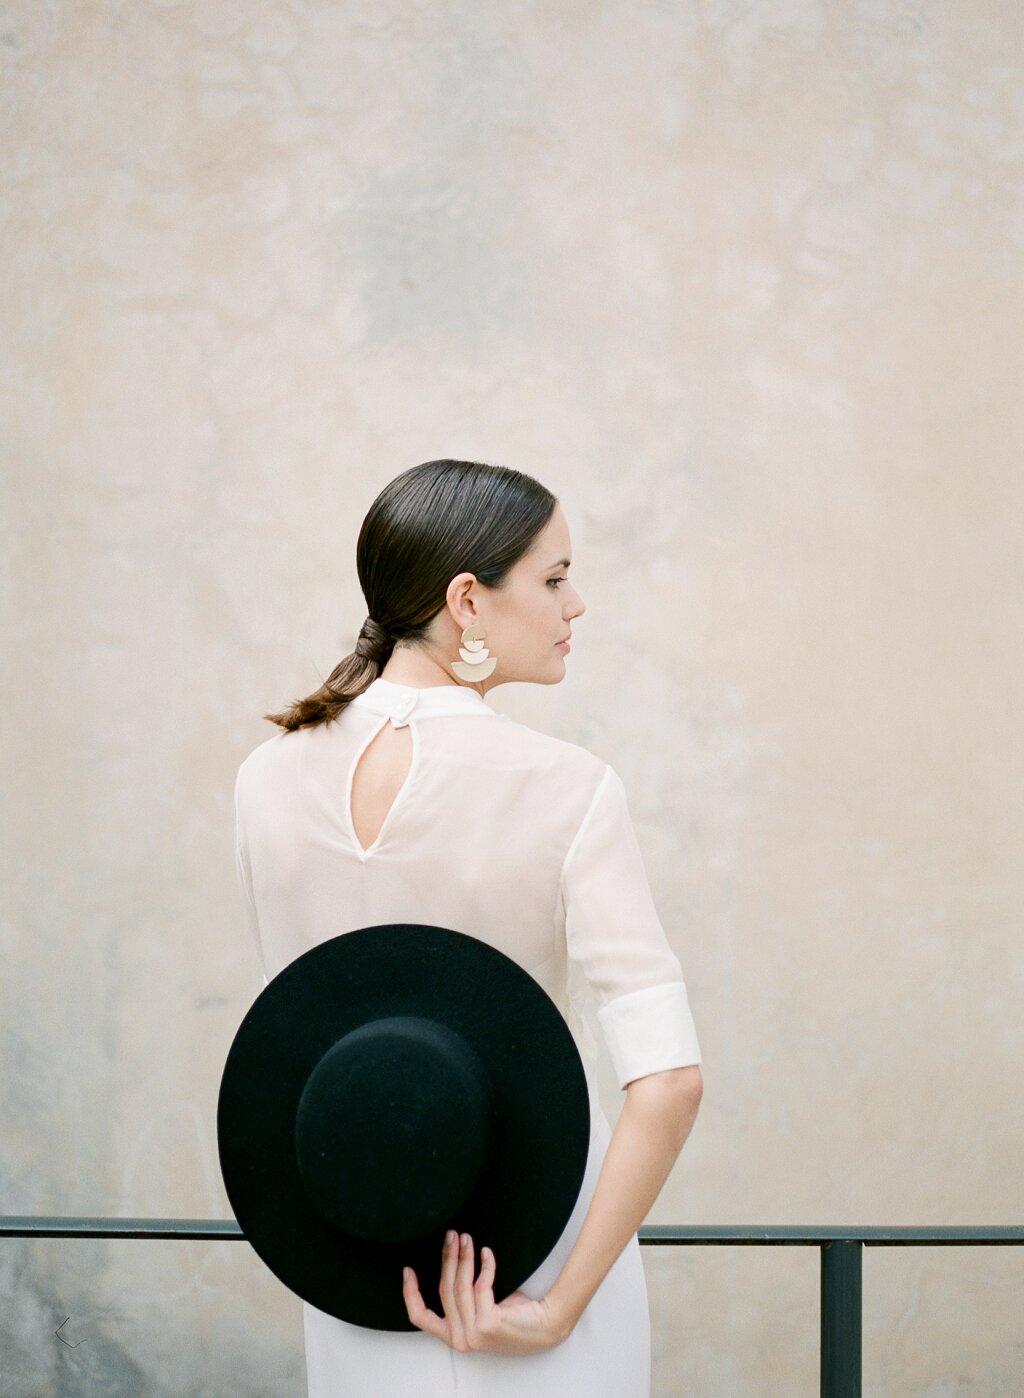 Fashion-engagement-shoot-Ravello-Italy-Amalfi Coast_Tanja Kibogo (1a) (1).JPG